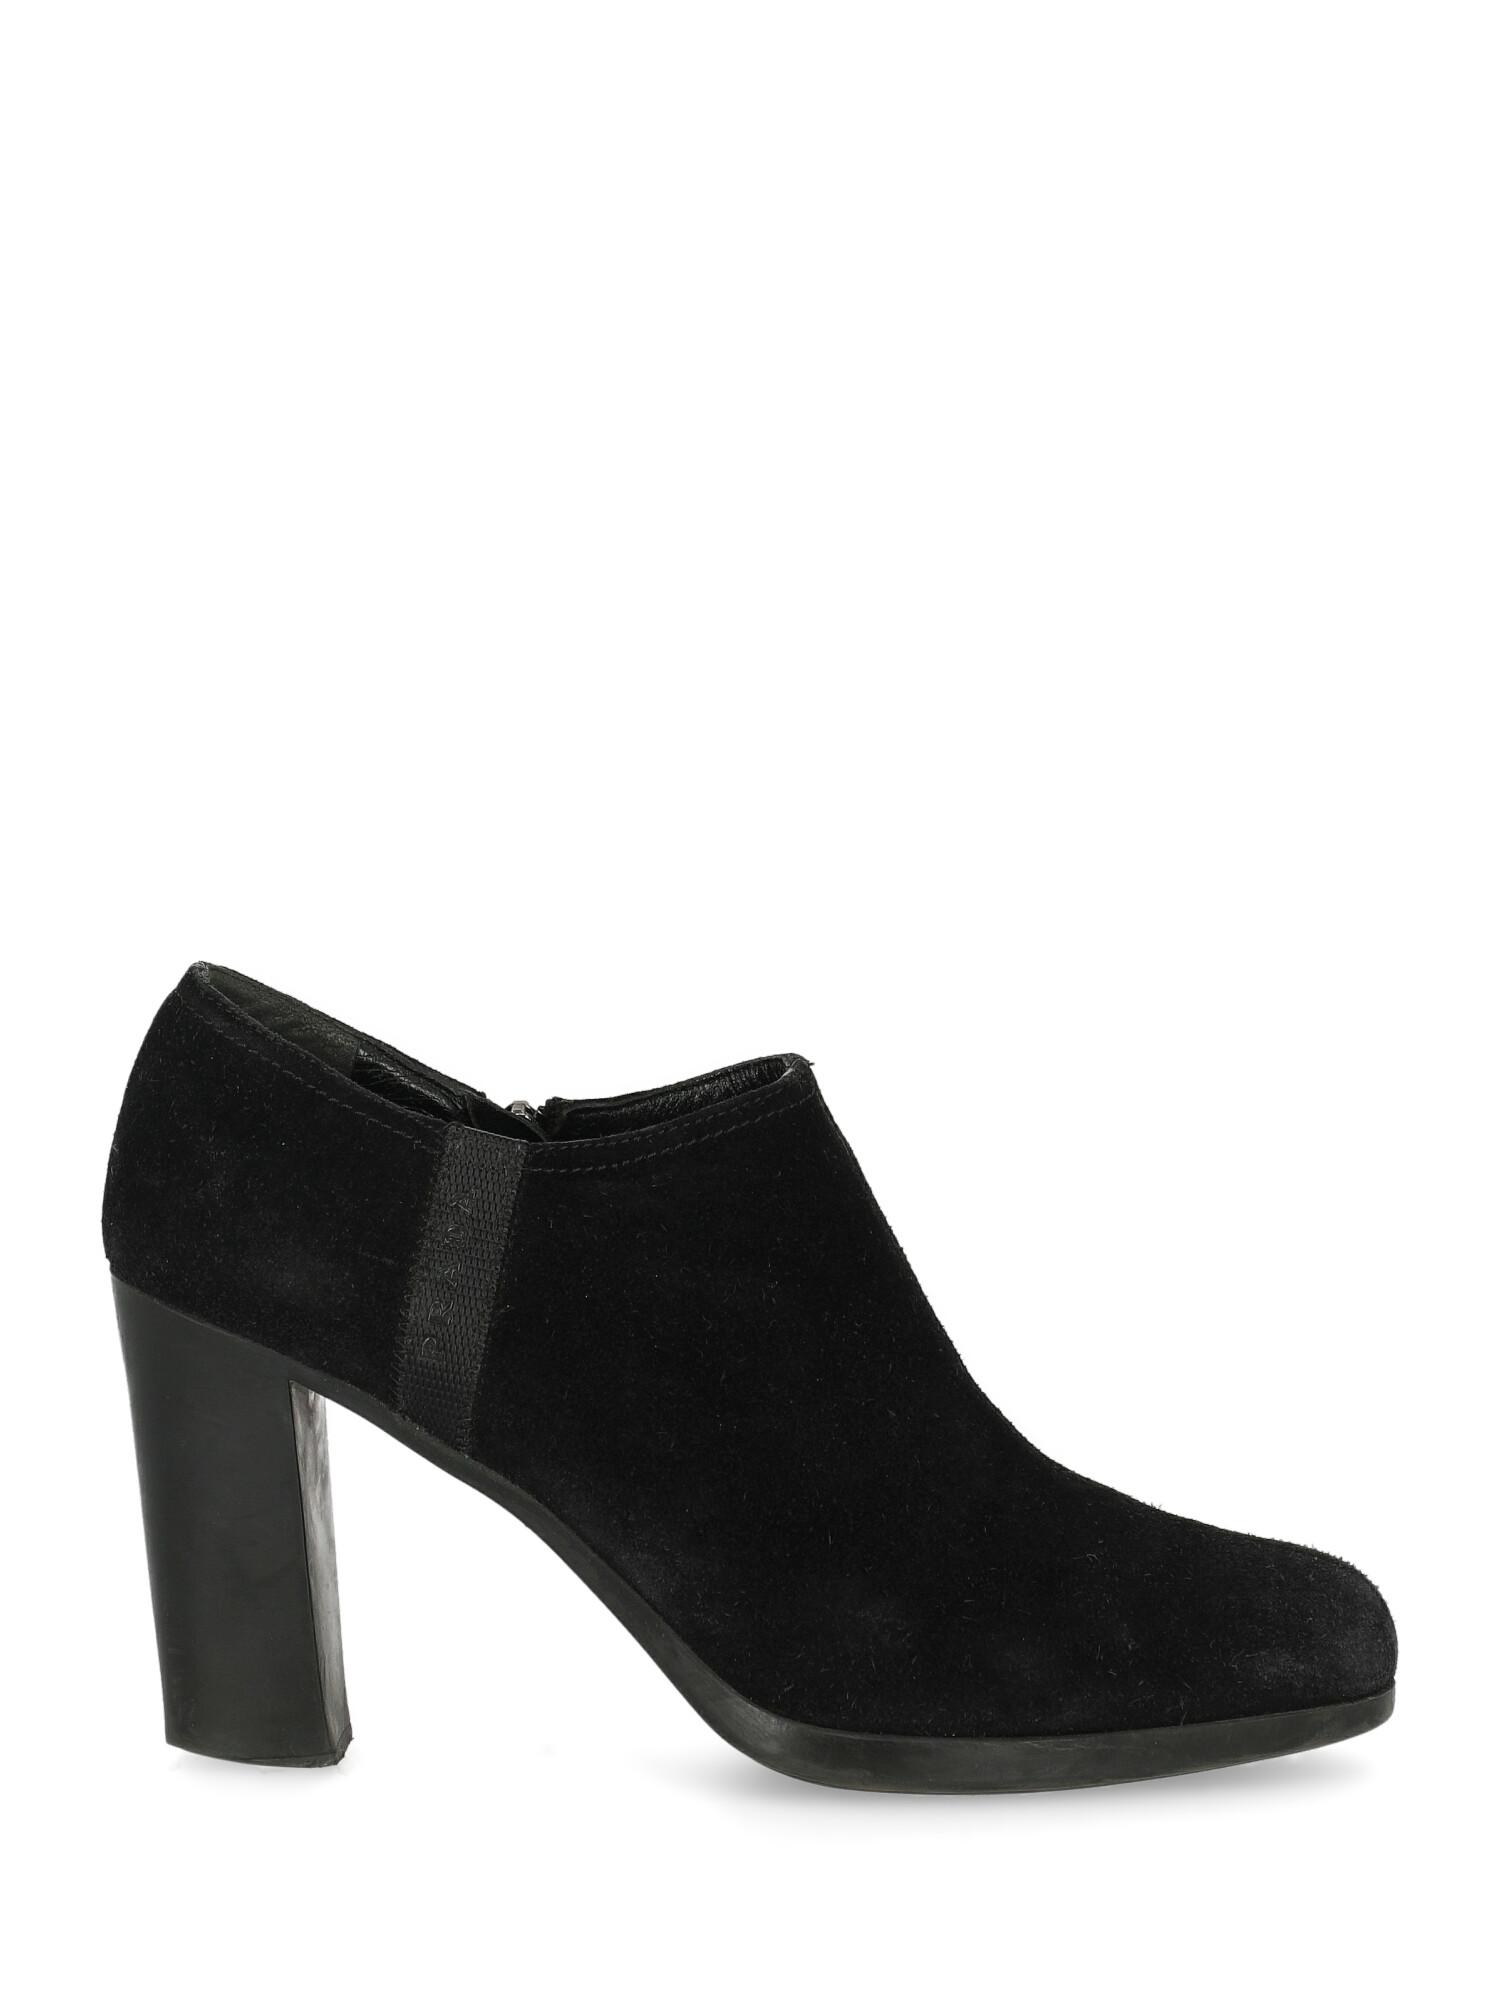 Pre-owned Prada Shoe In Black